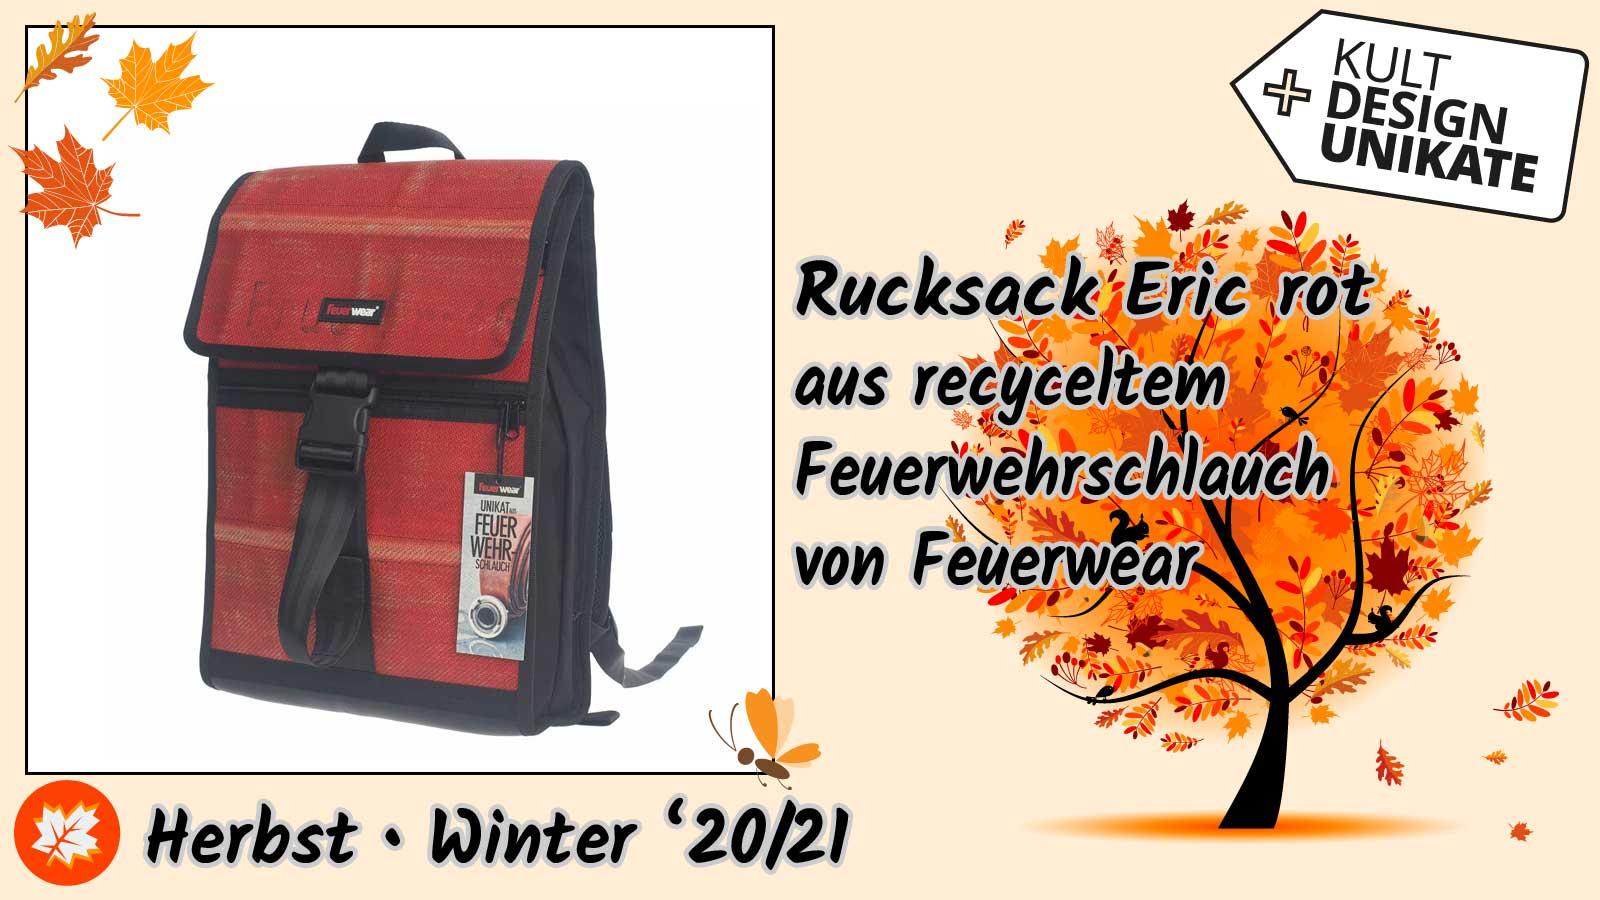 Feuerwear-Rucksack-Eric-rot